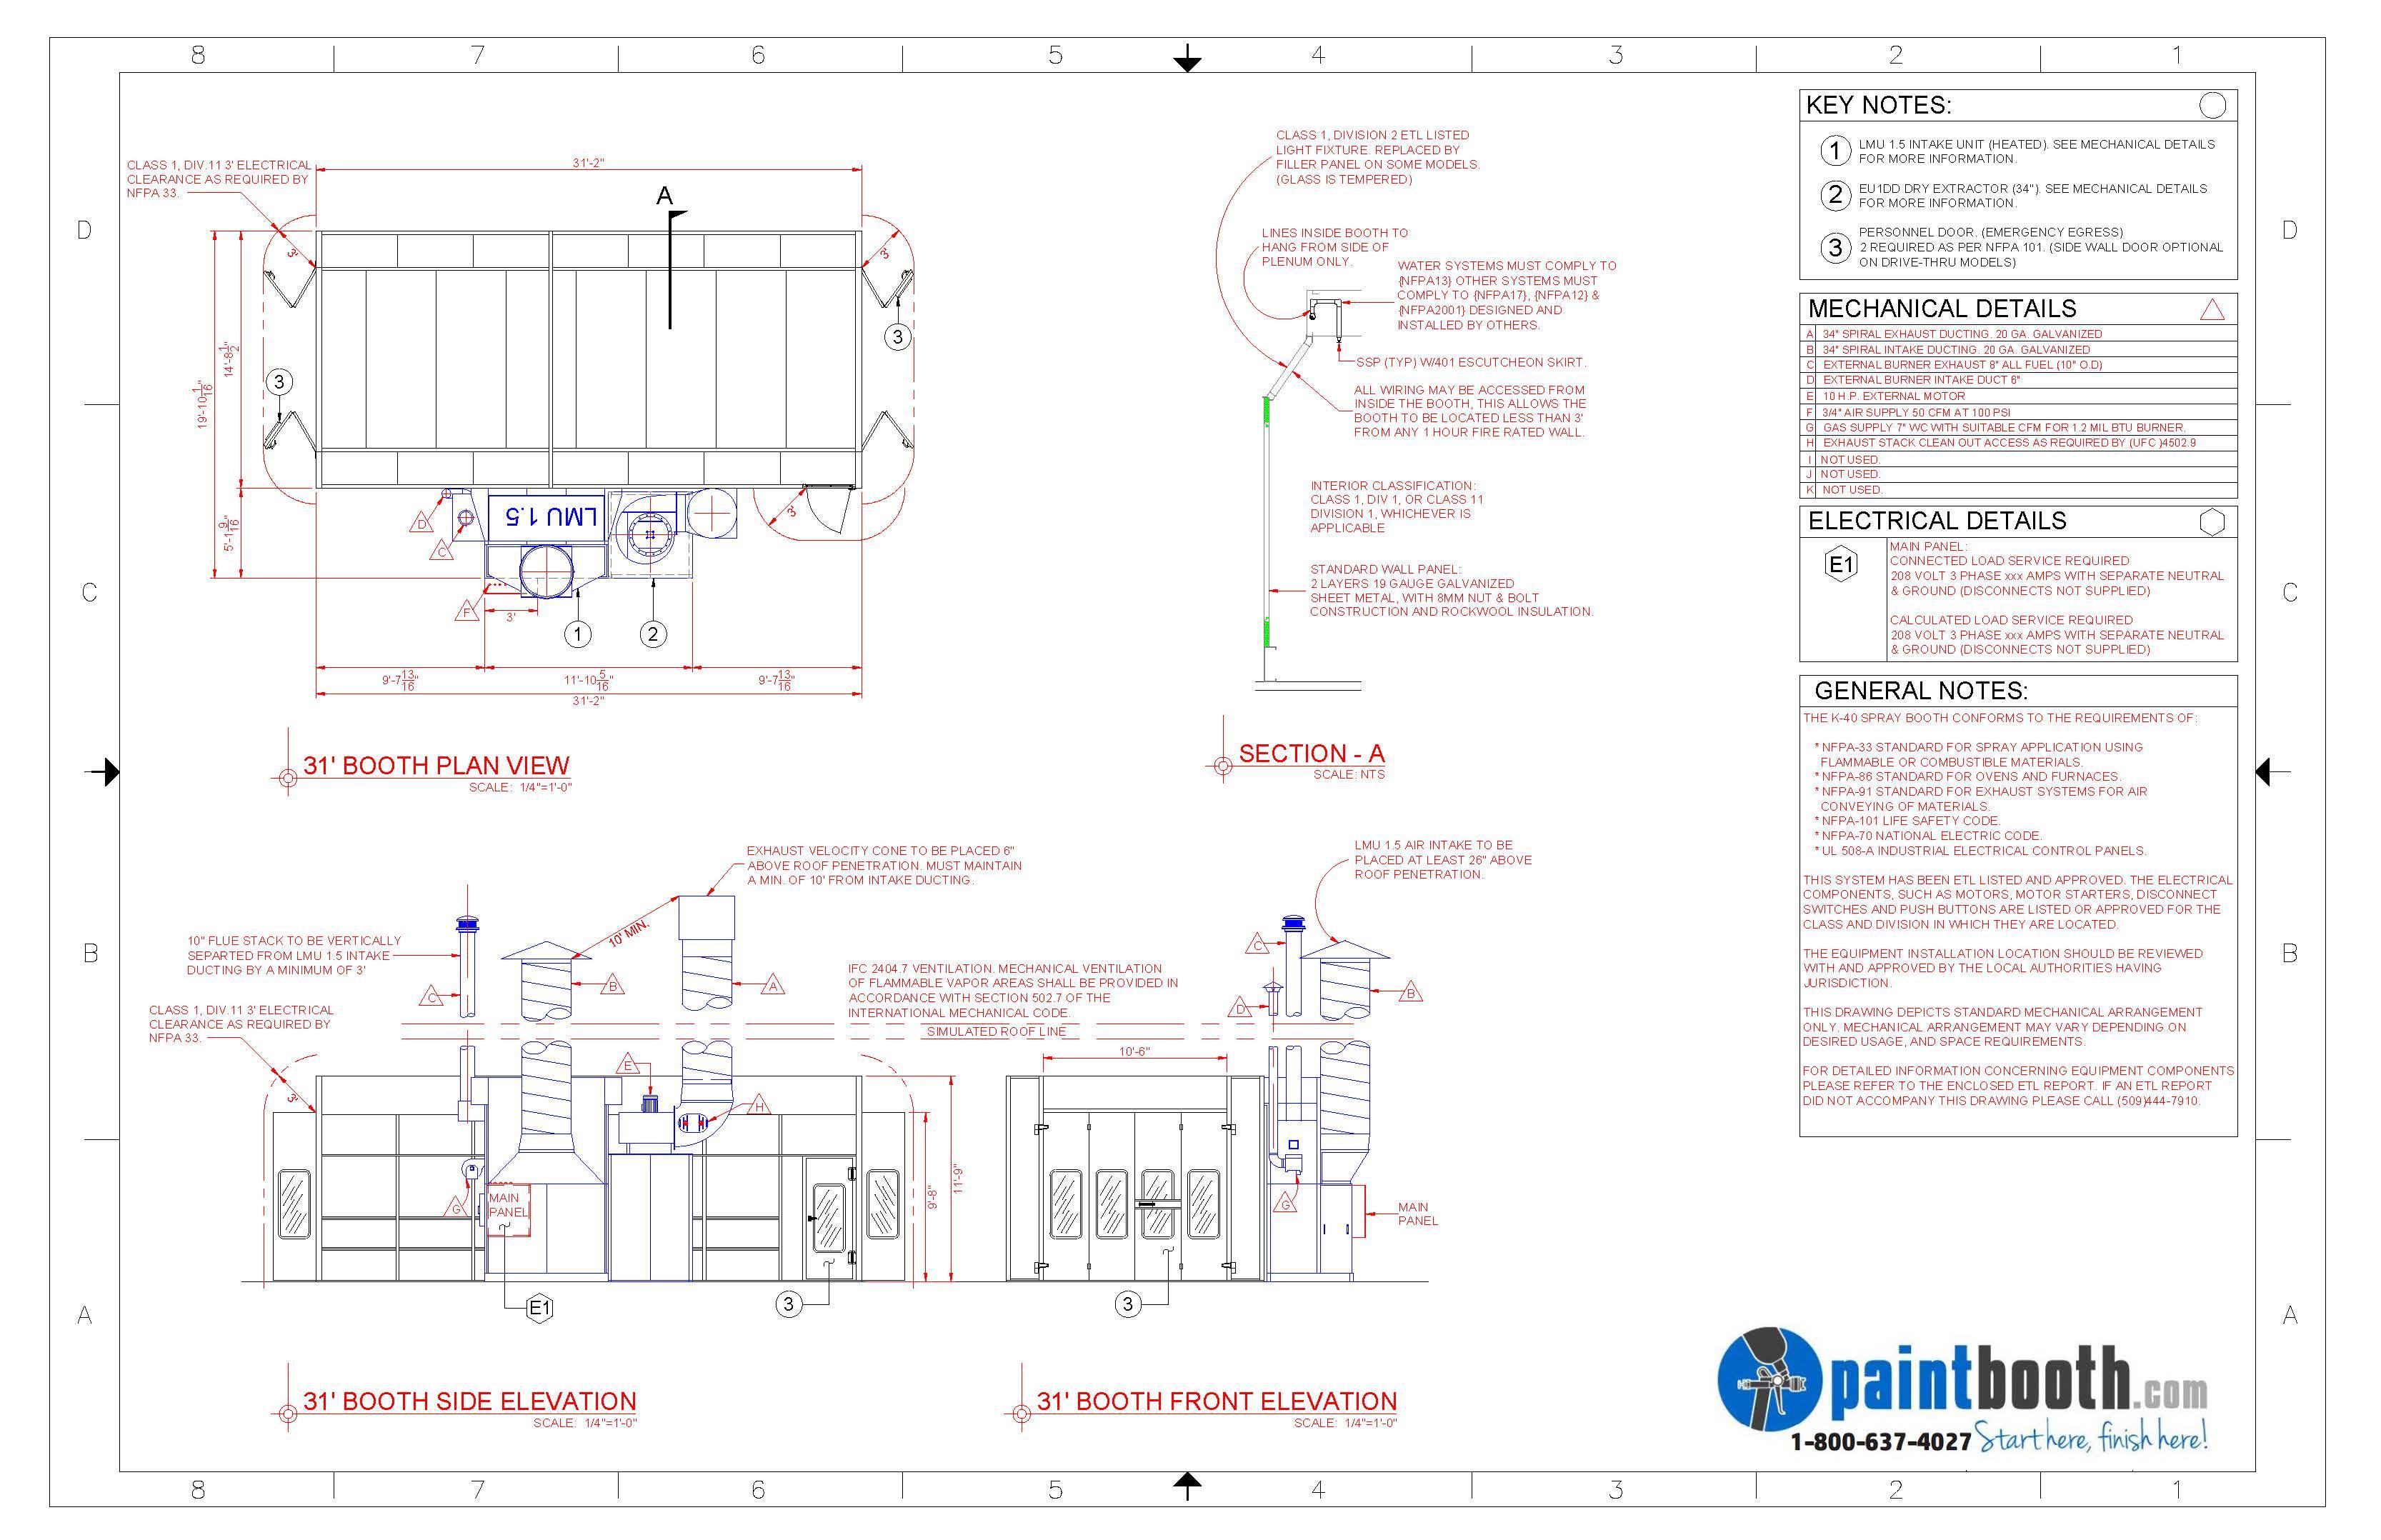 Spray Booth Wiring Diagram - Wiring Diagram Information on